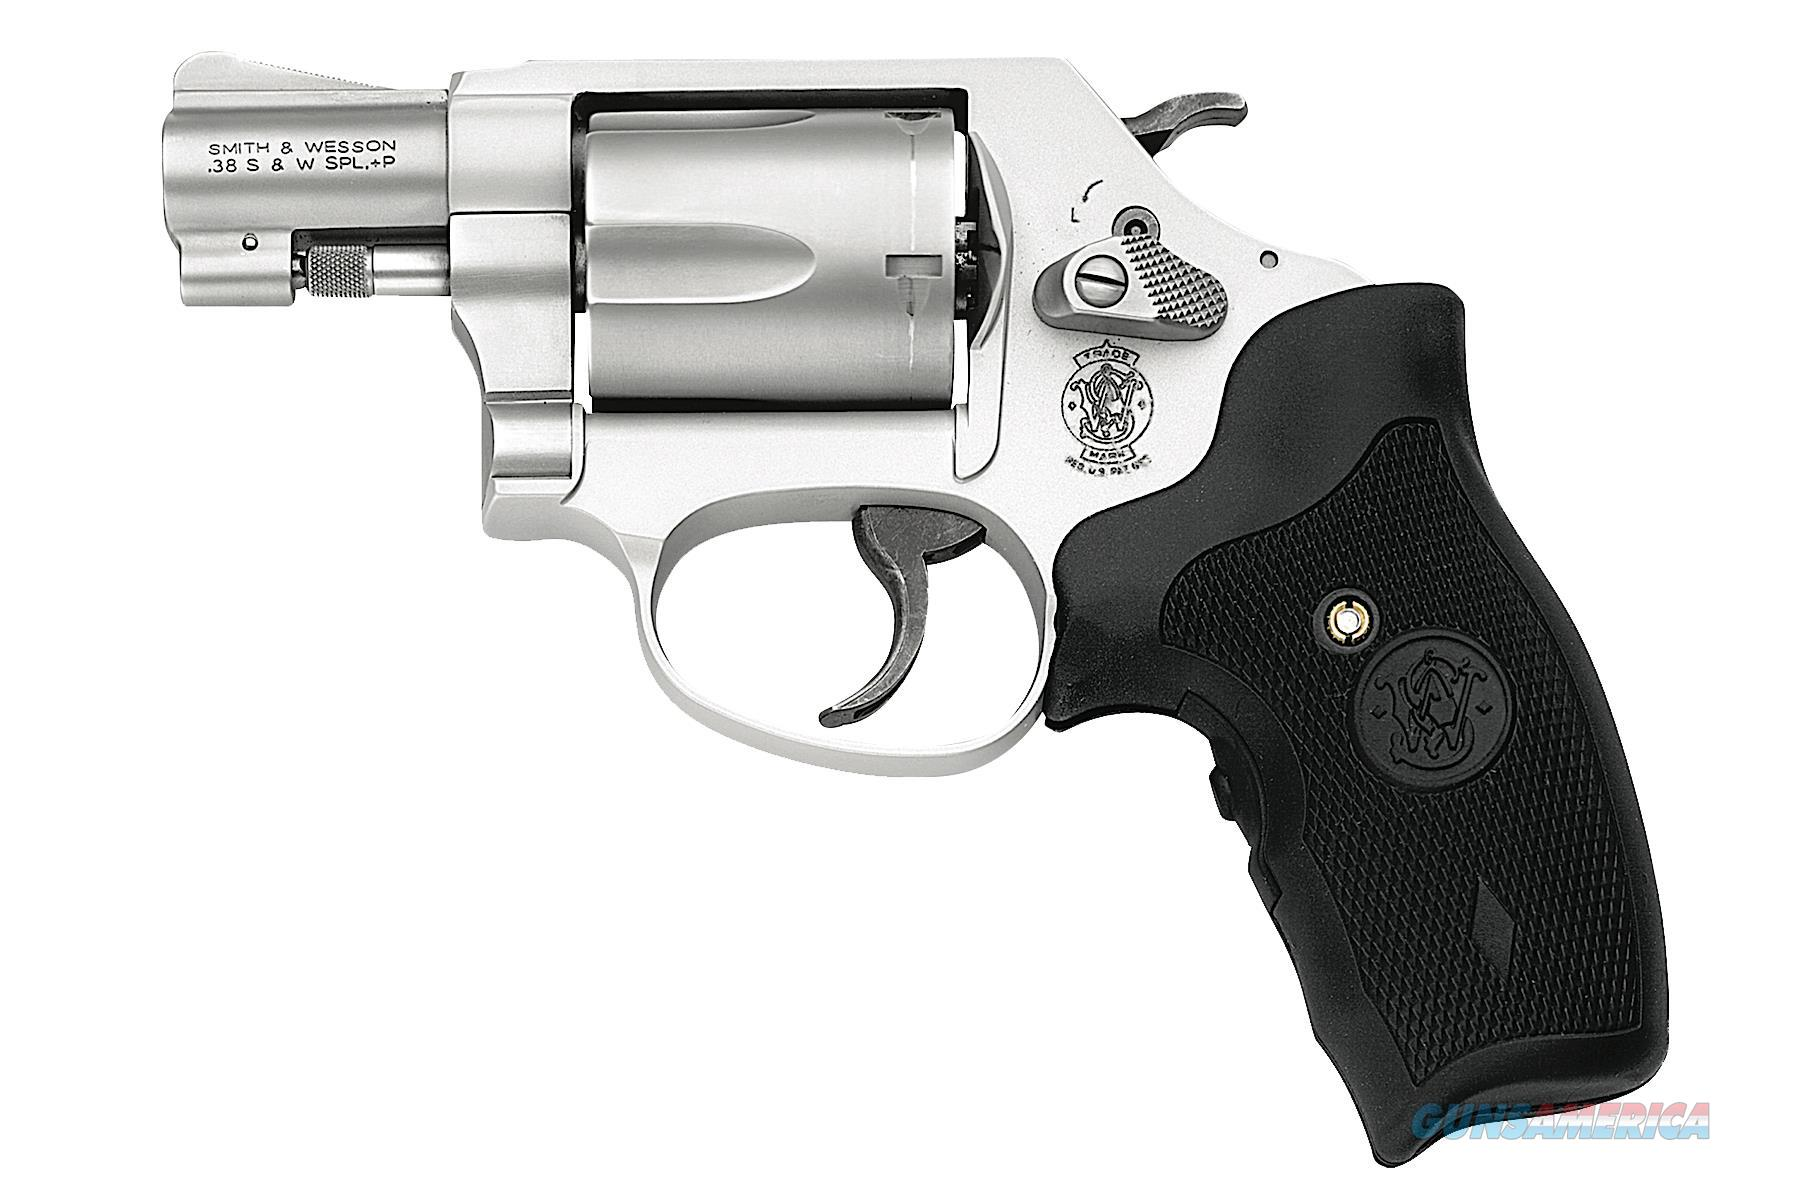 Smith & Wesson Mod 637 Chfs Spl 38Spl+P 163052  Guns > Pistols > S Misc Pistols